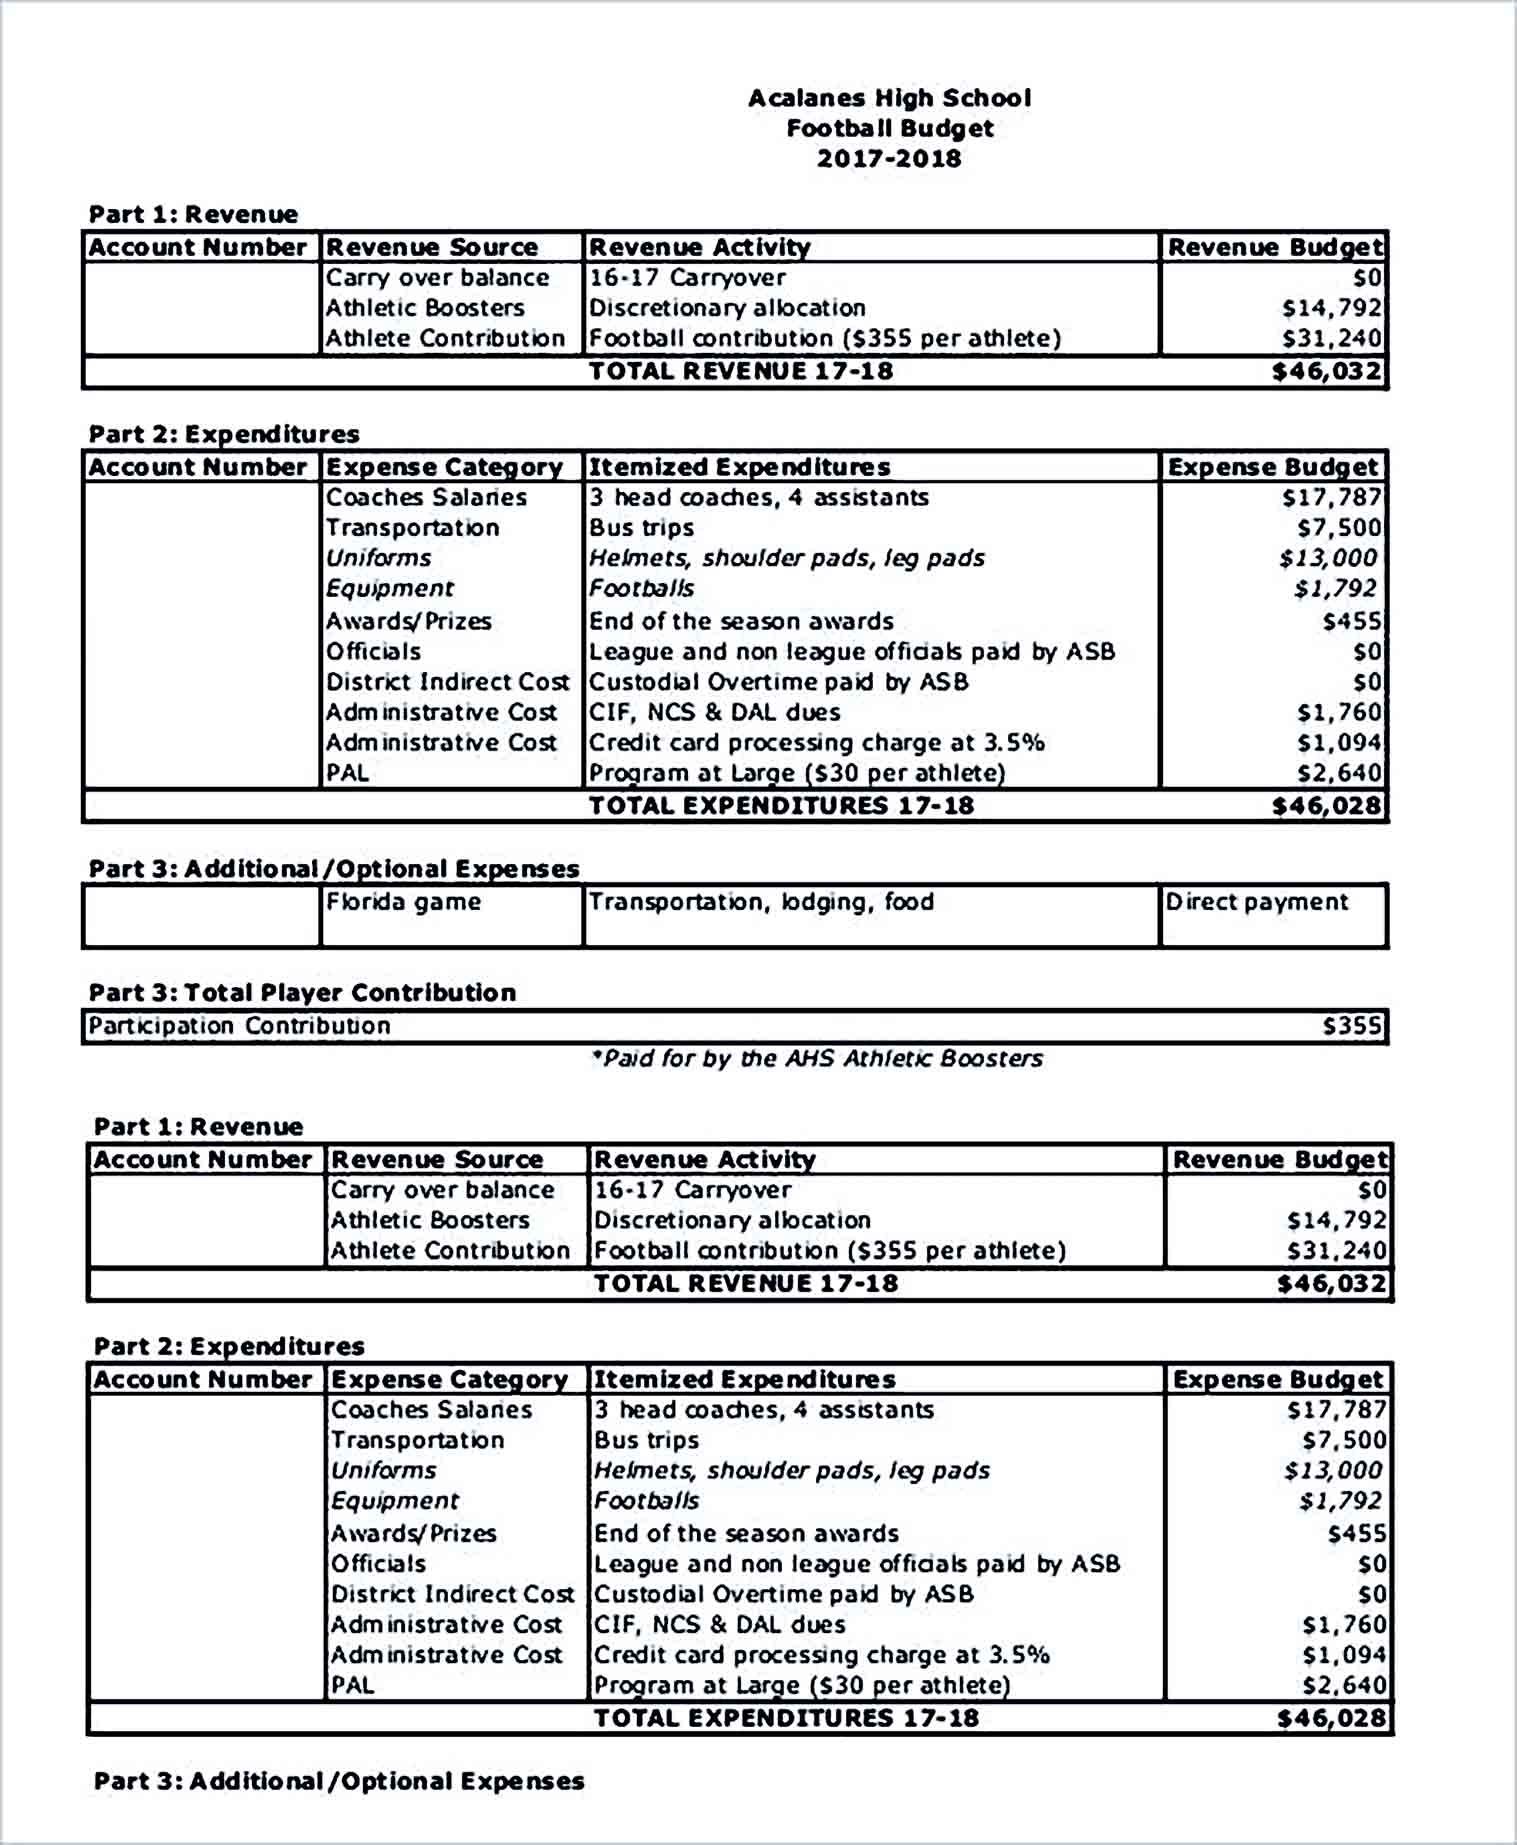 Sample Acalanes High School Football Budget